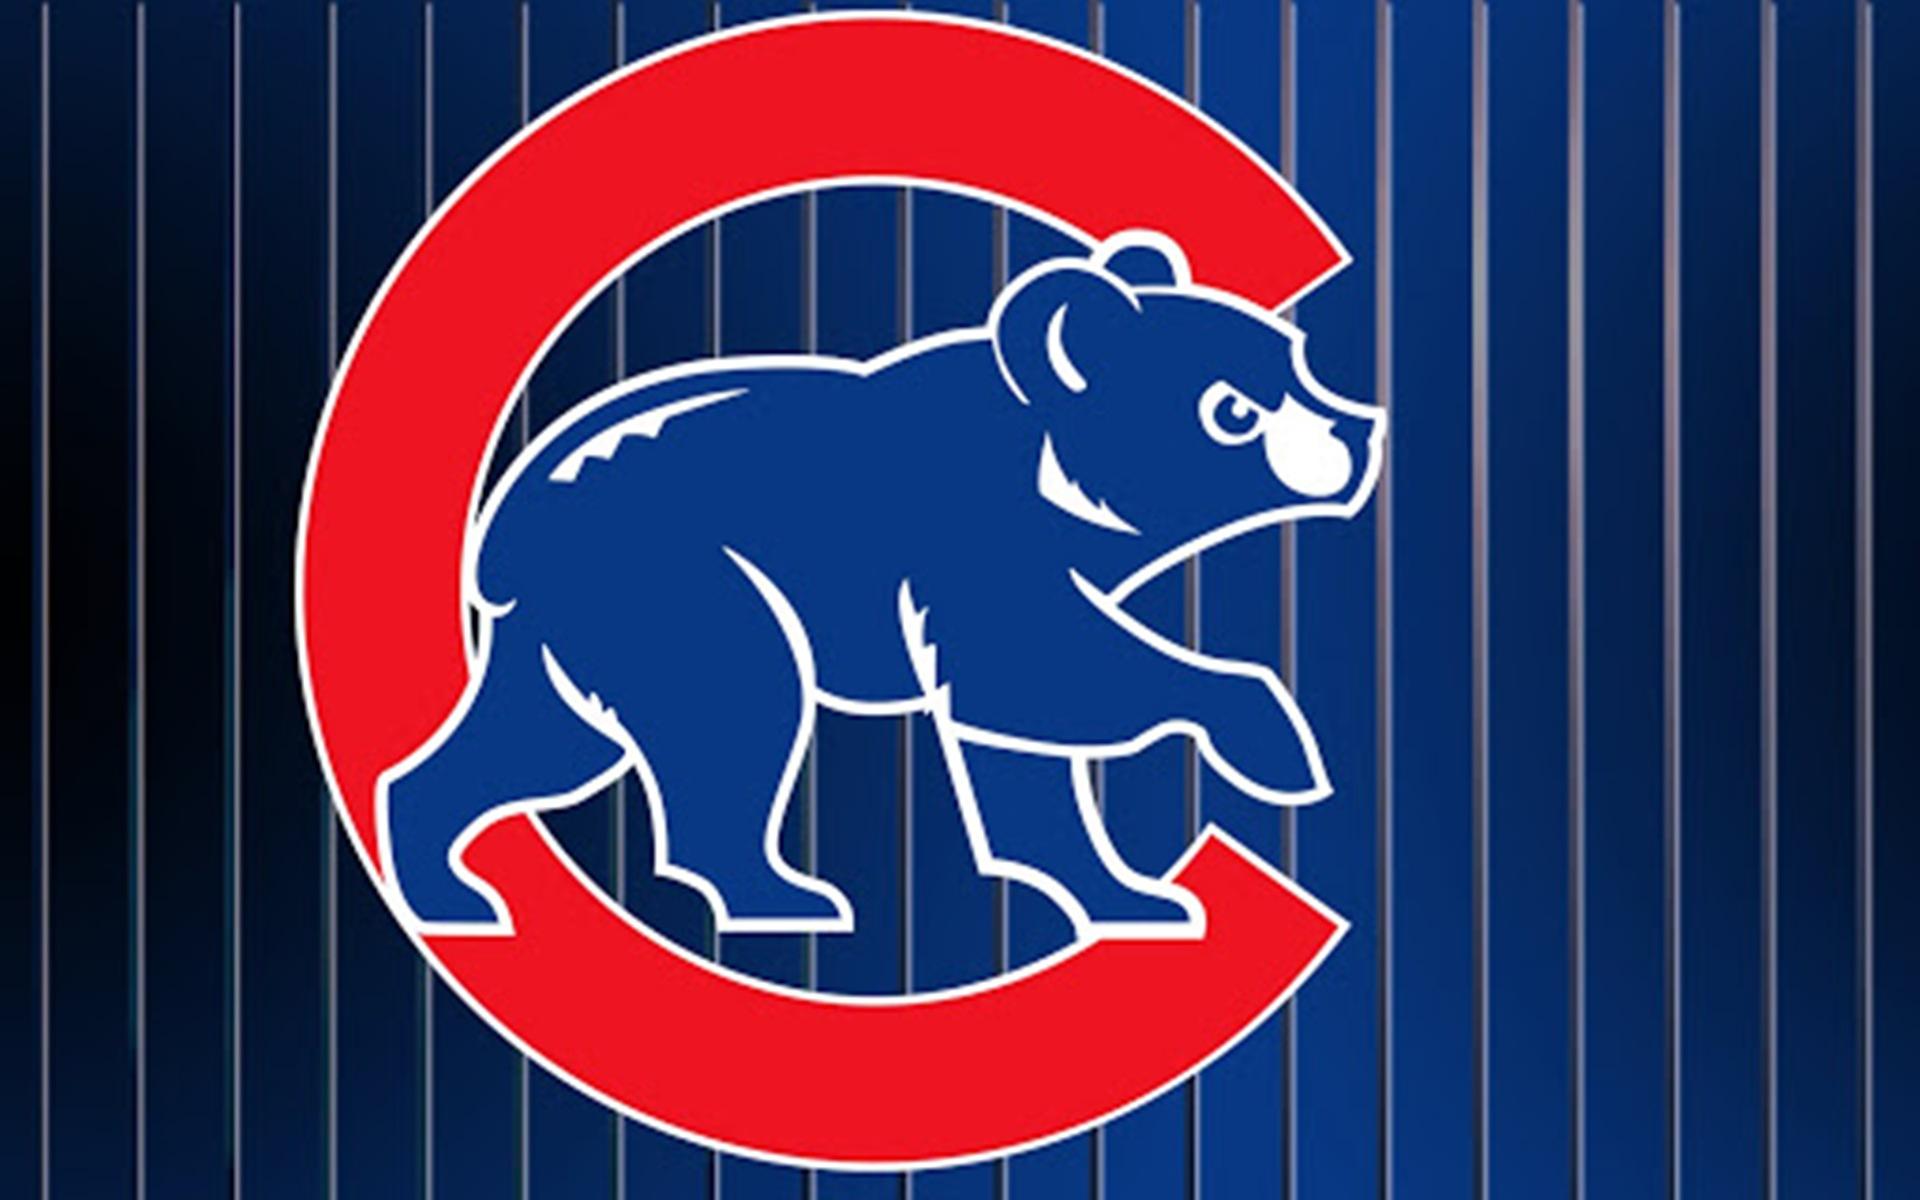 Chicago Cubs Wallpaper Hd